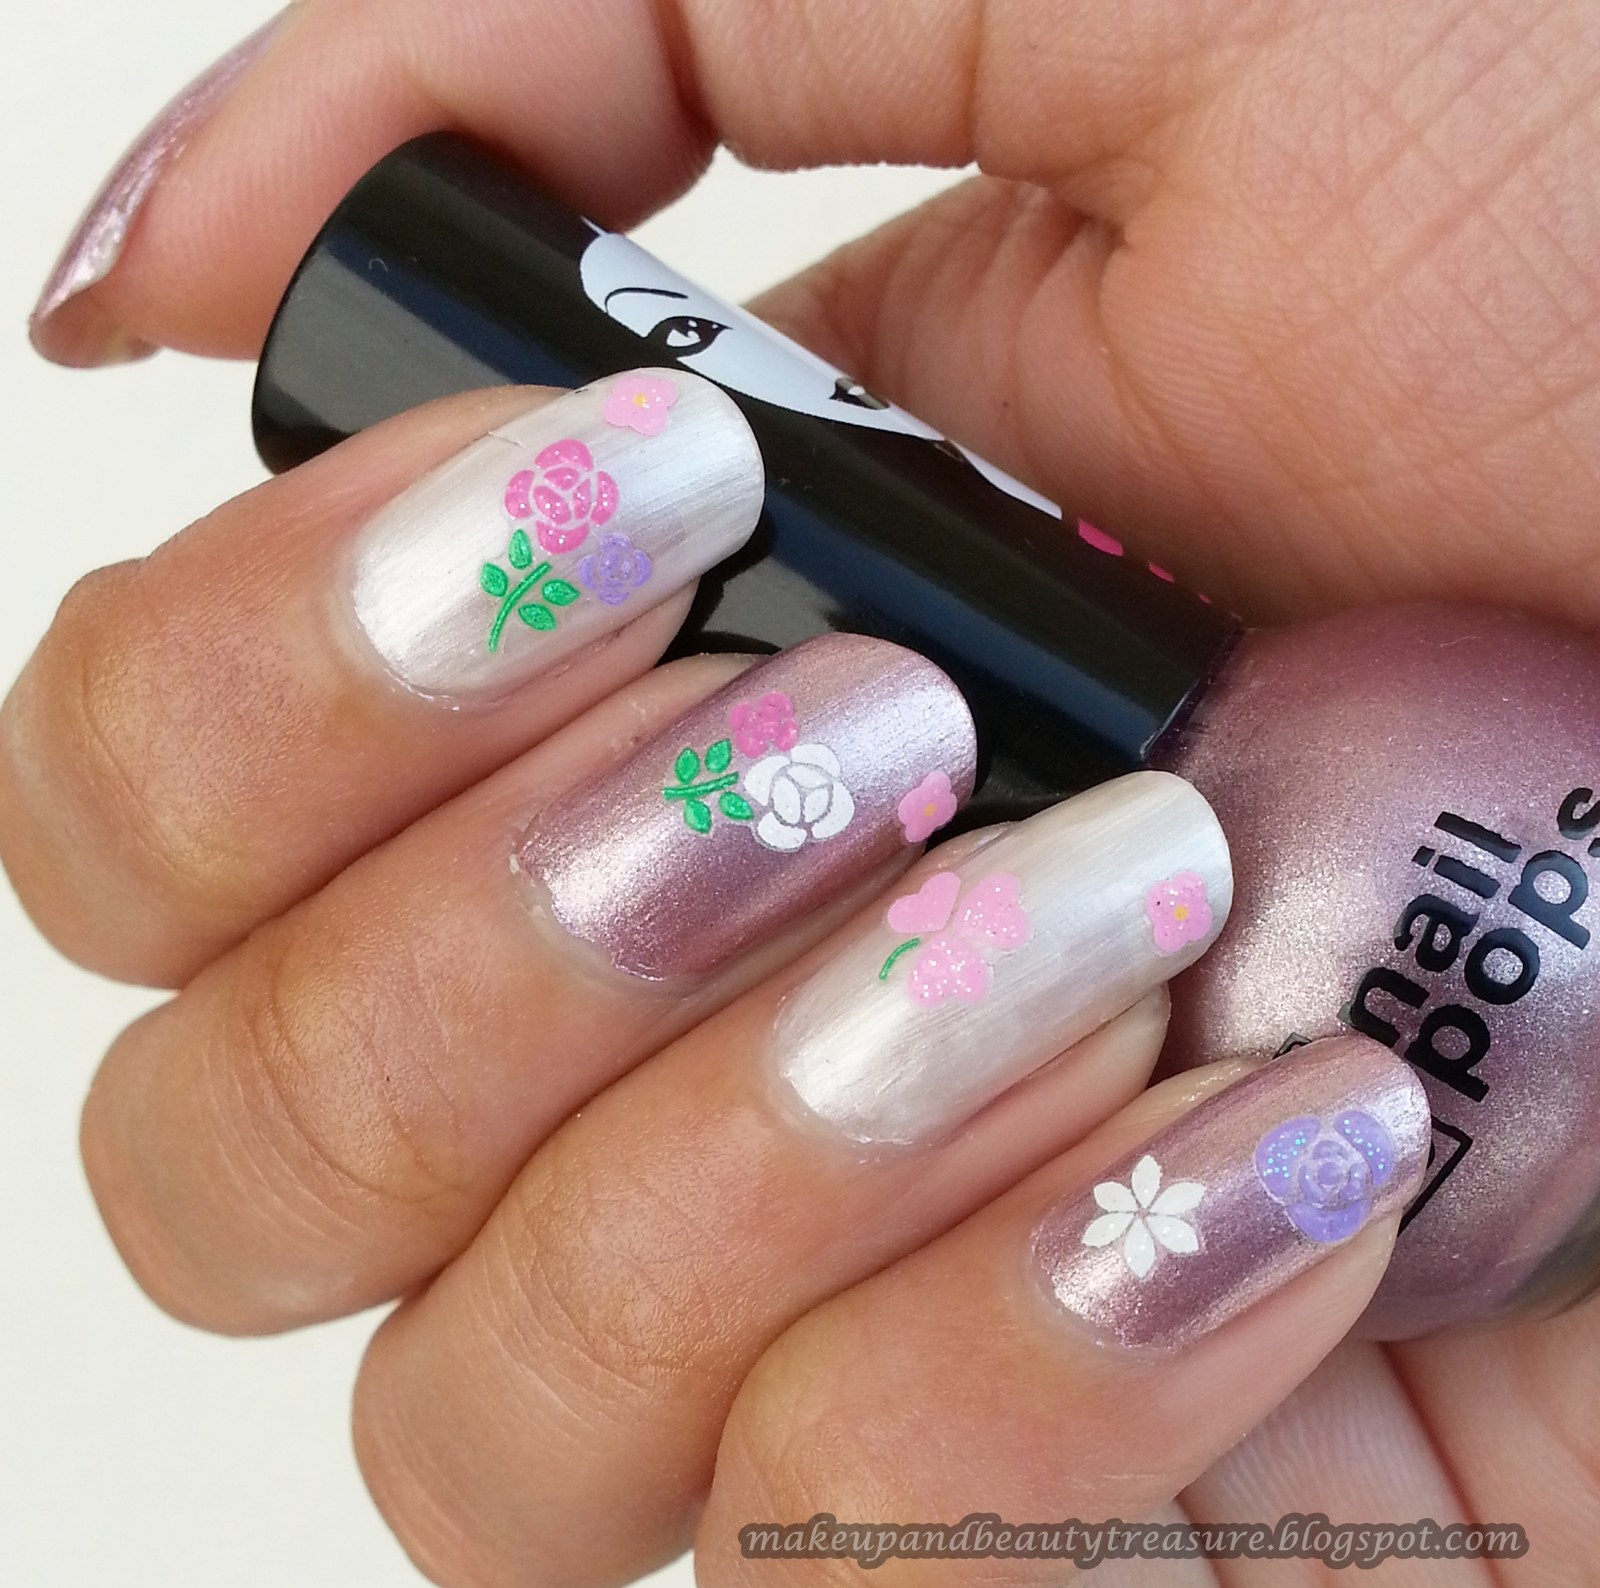 3d Nail Art Flowers Joby 3d nail art stickers